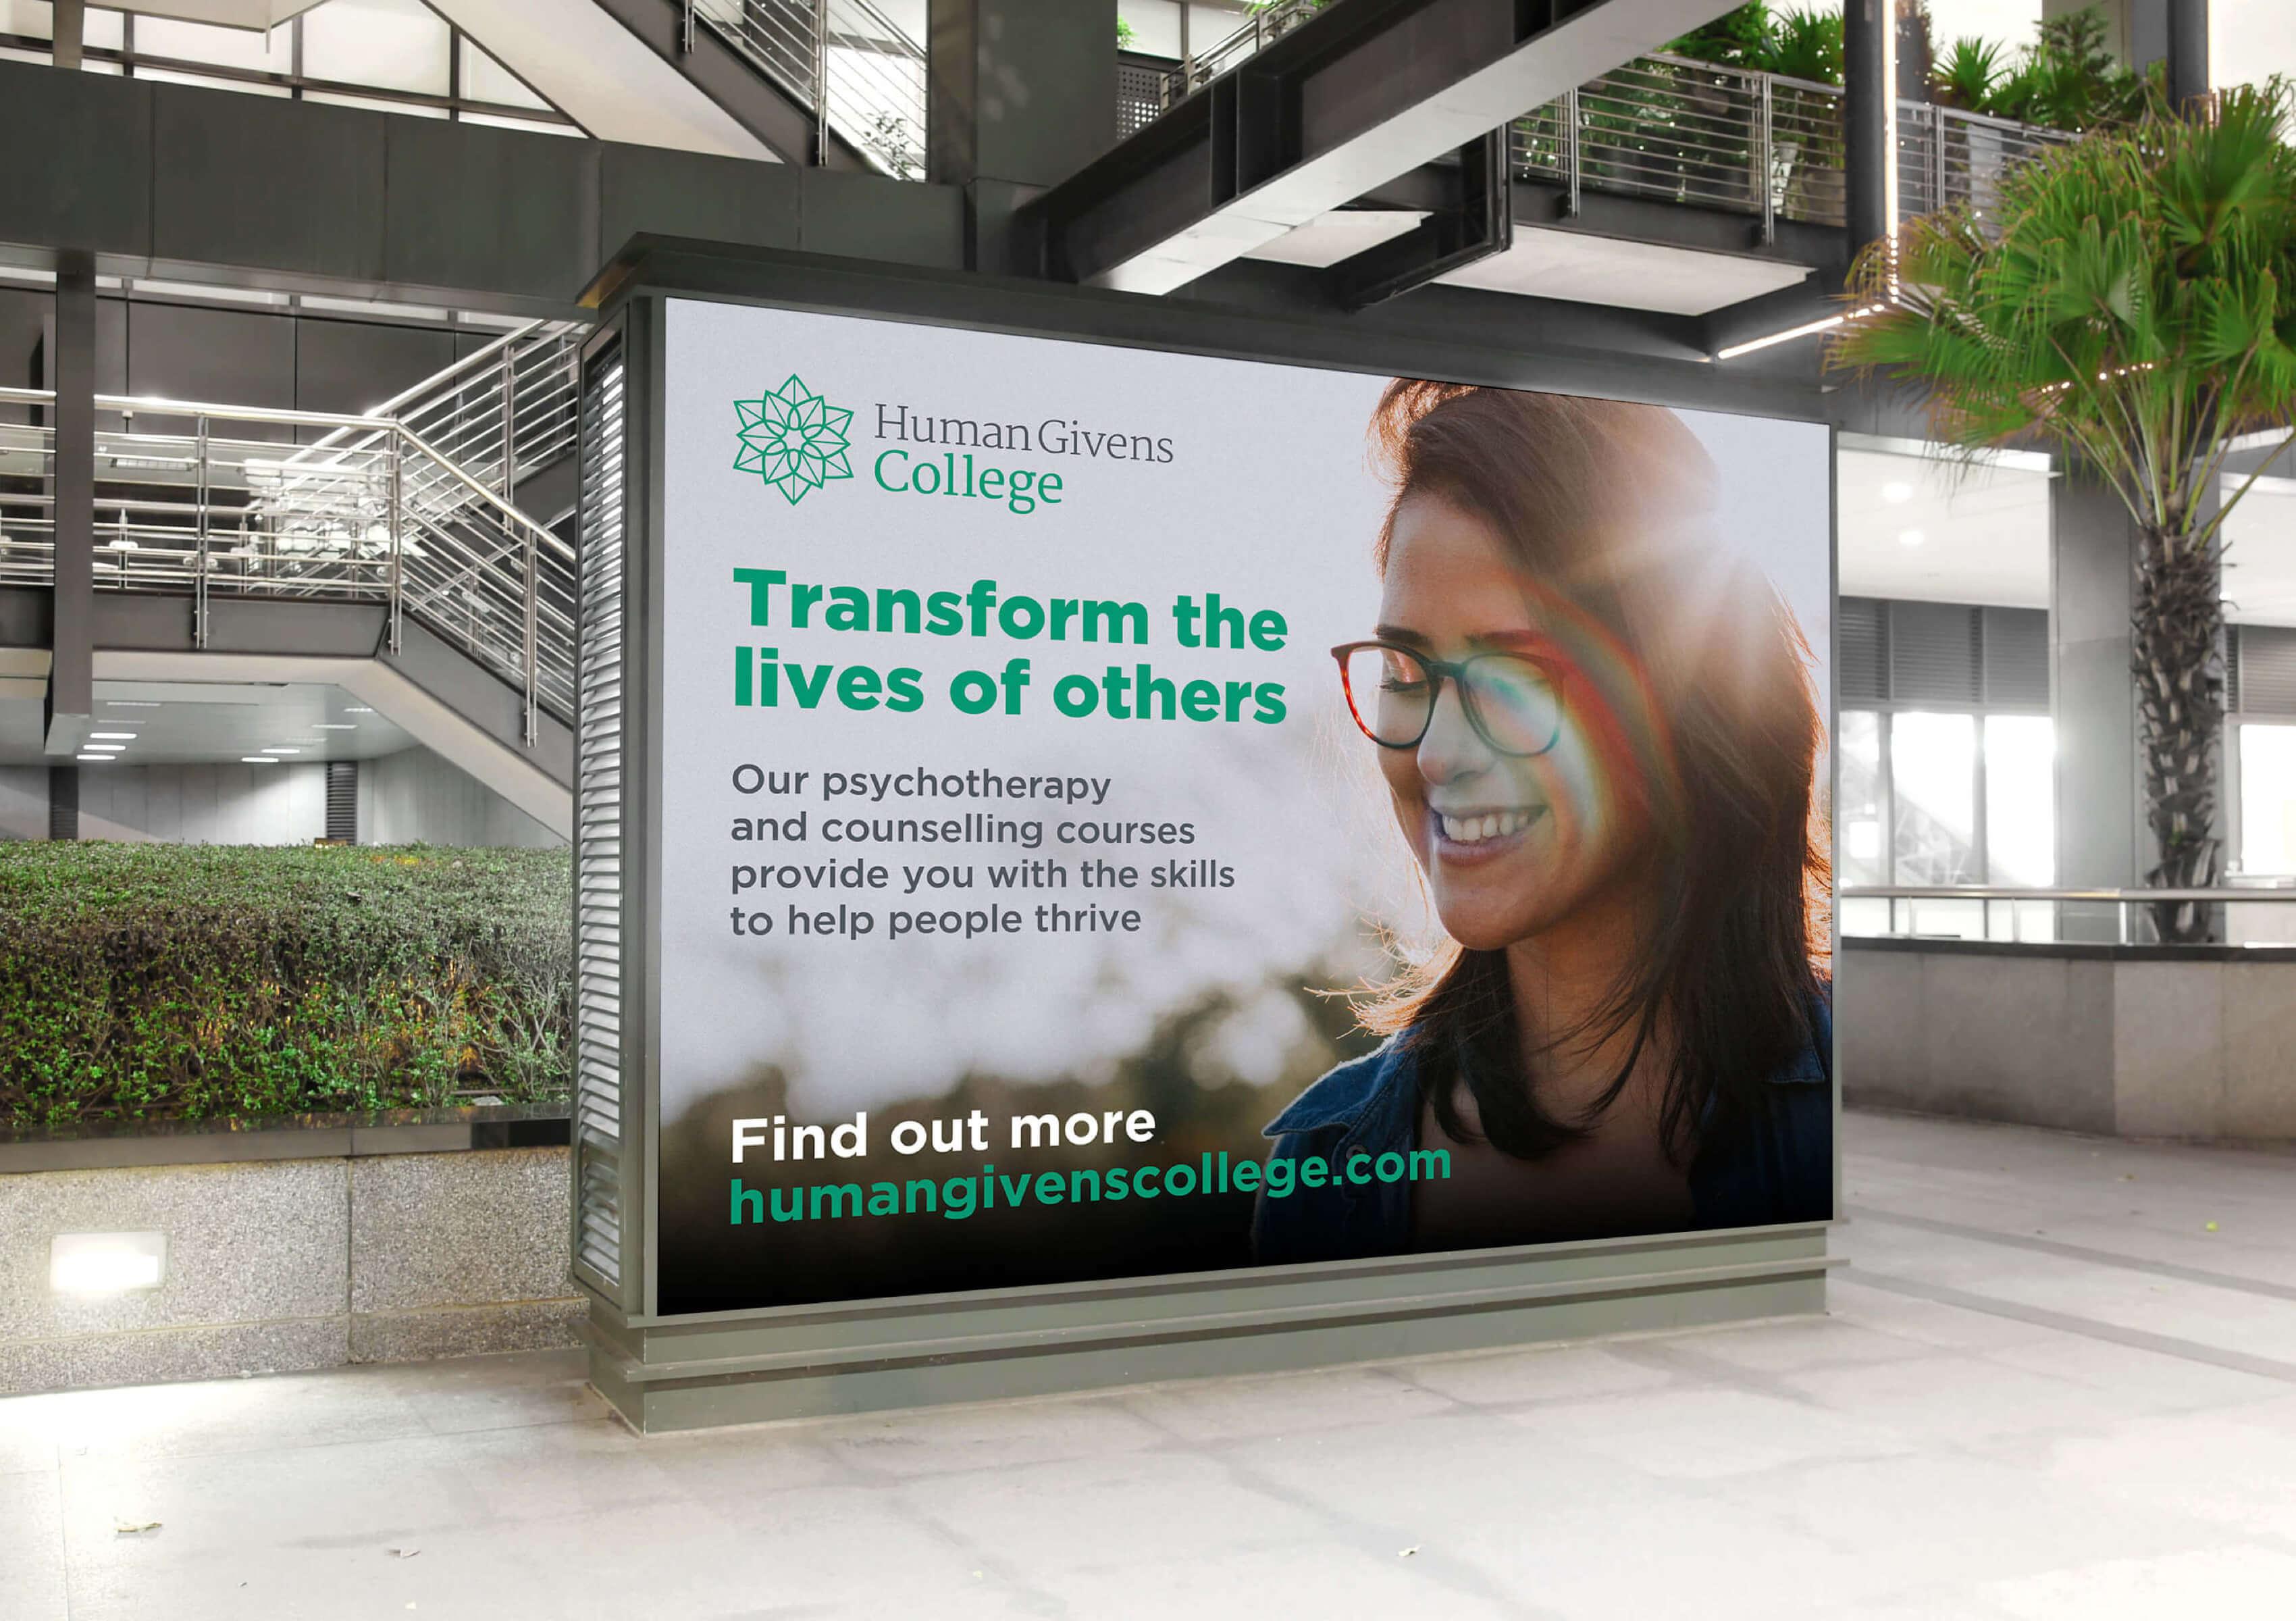 Human Givens billboard